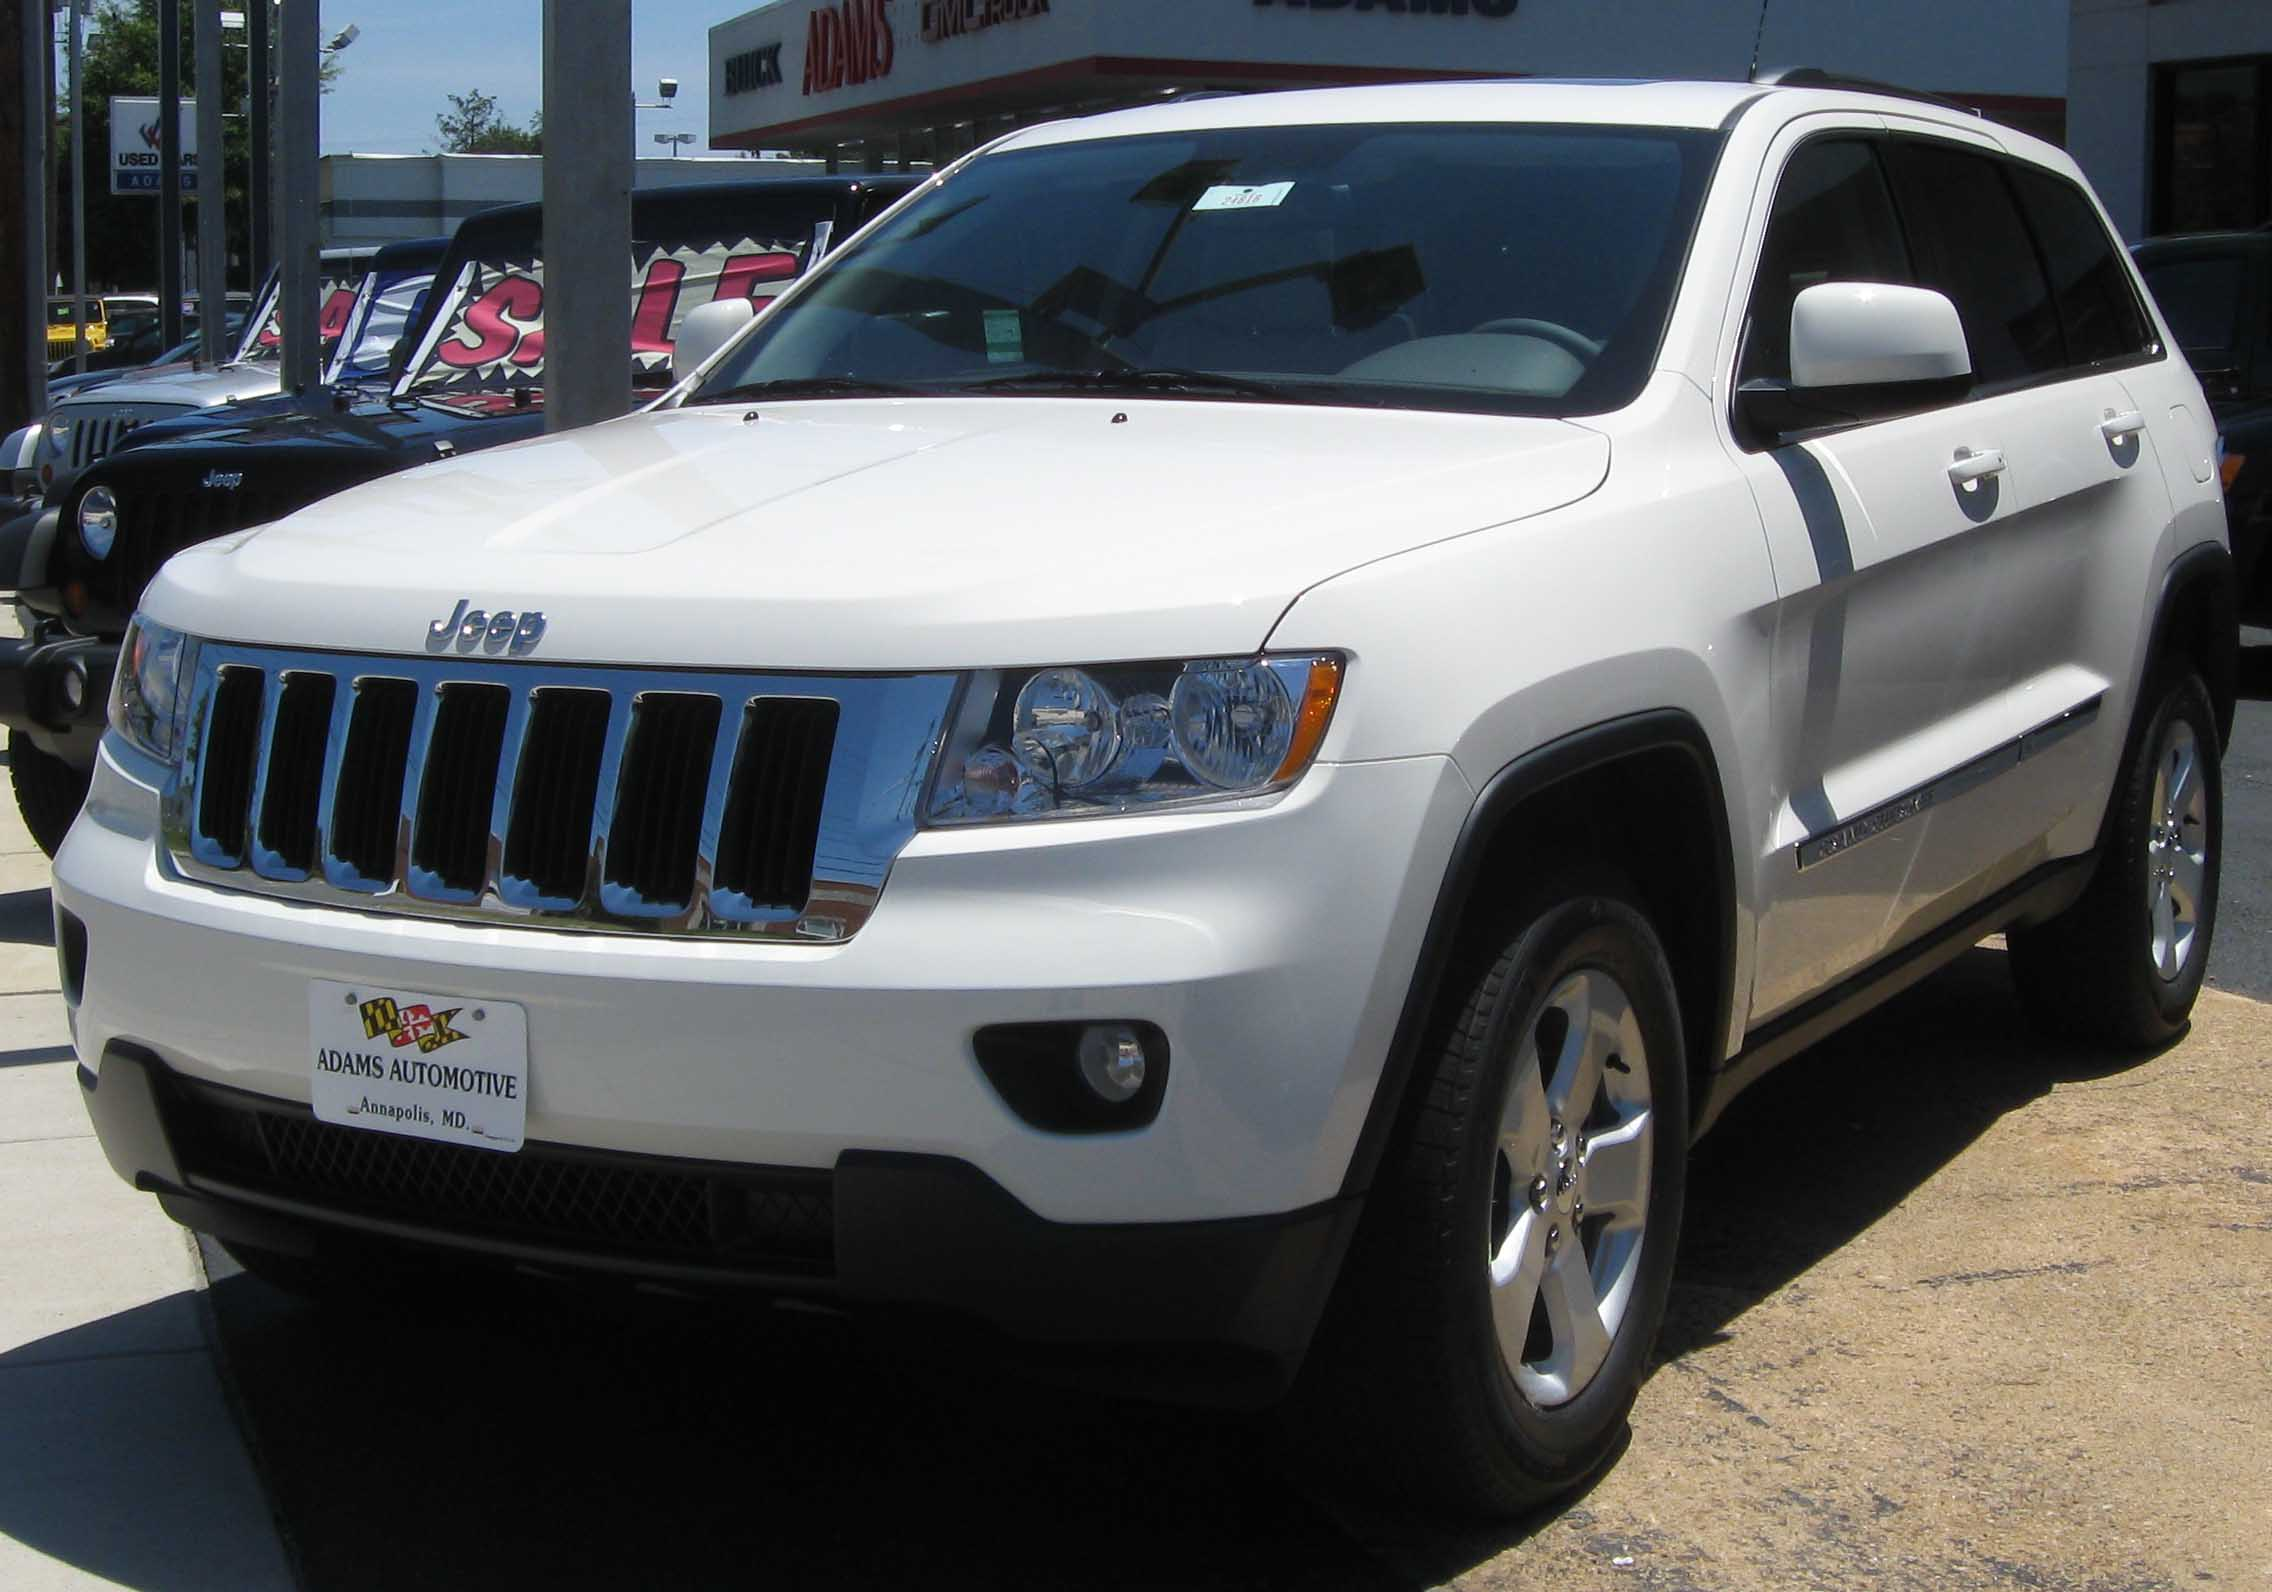 file:2011 jeep grand cherokee laredo x -- 07-03-2010